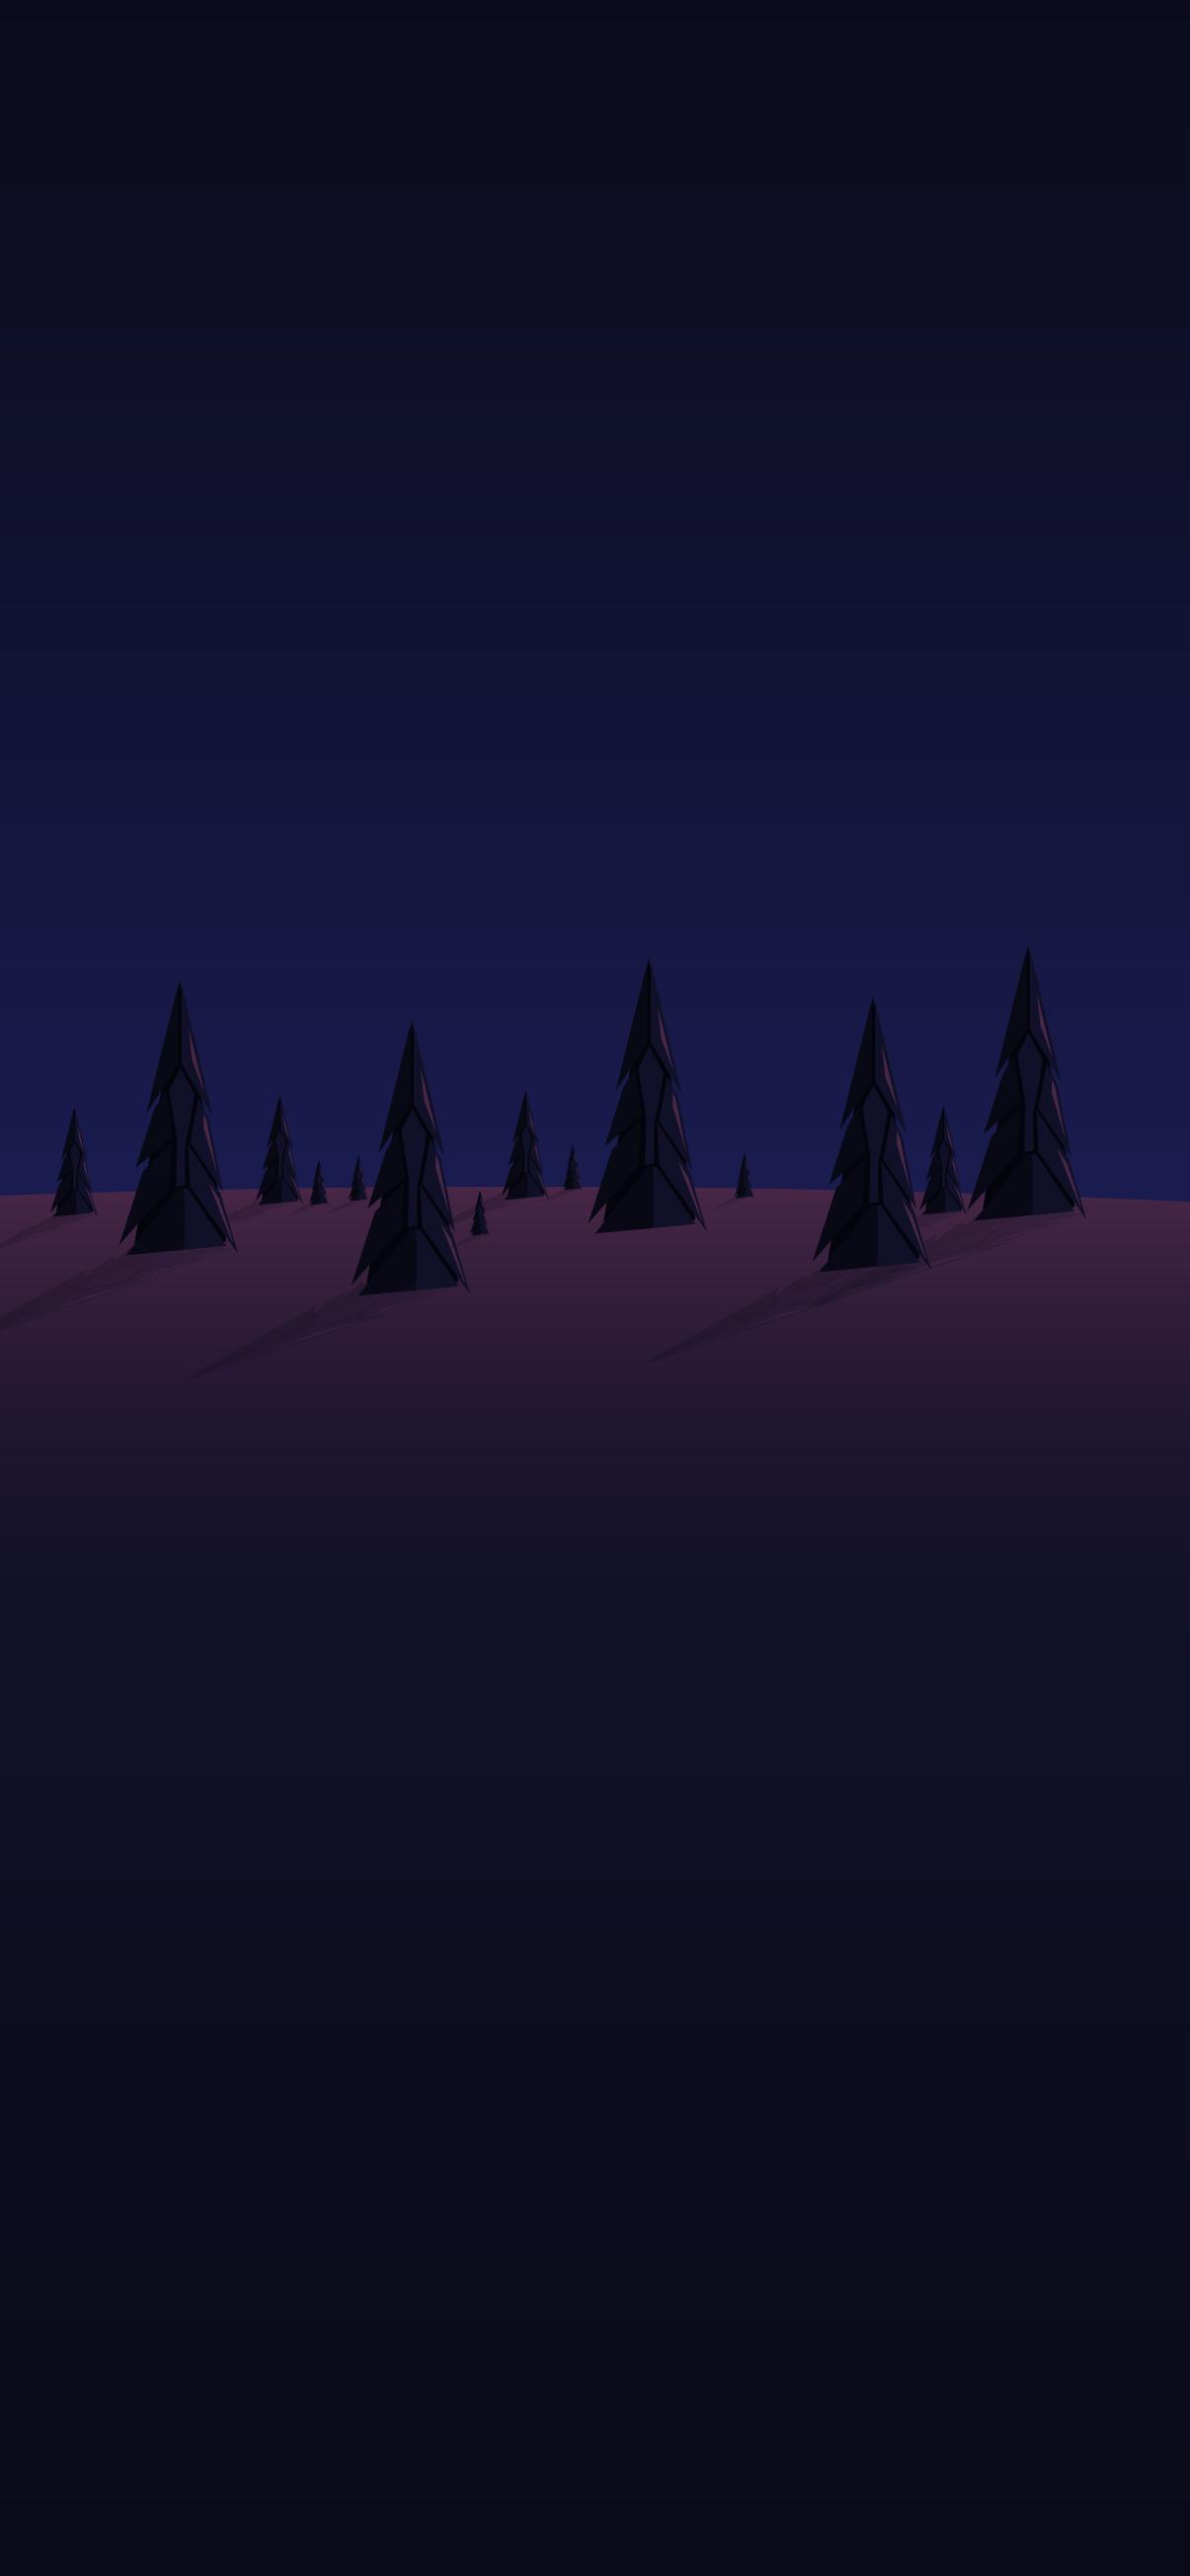 minimalist forest night phone background wallpaper 4k